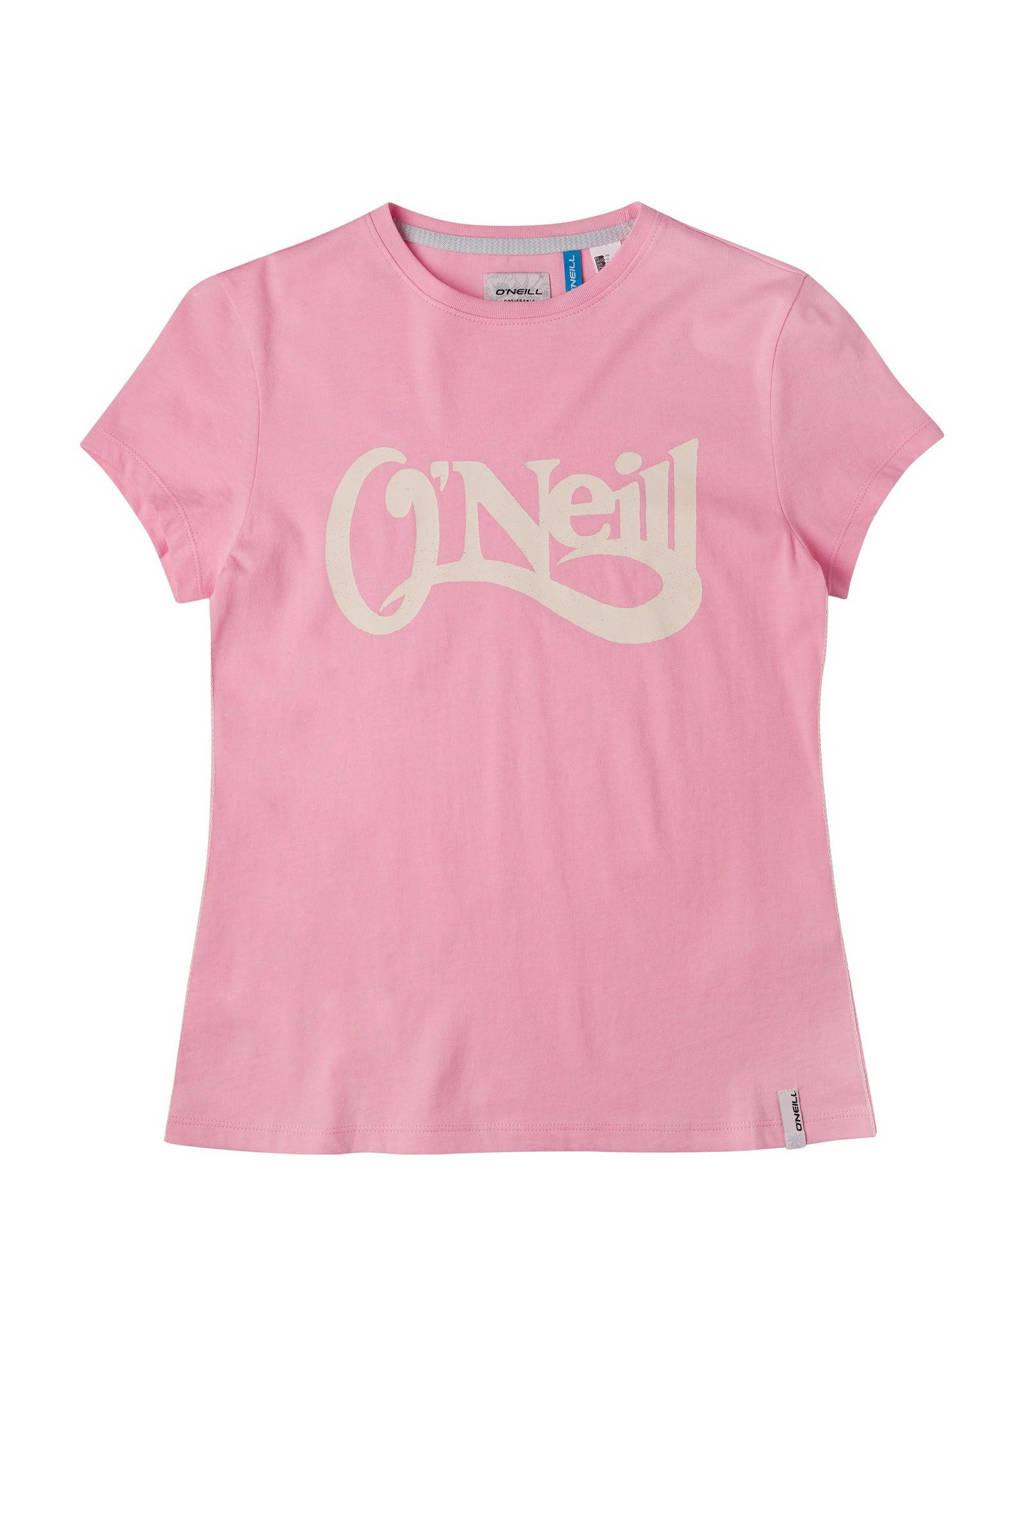 O'Neill Blue T-shirt Waves met logo roze, Roze